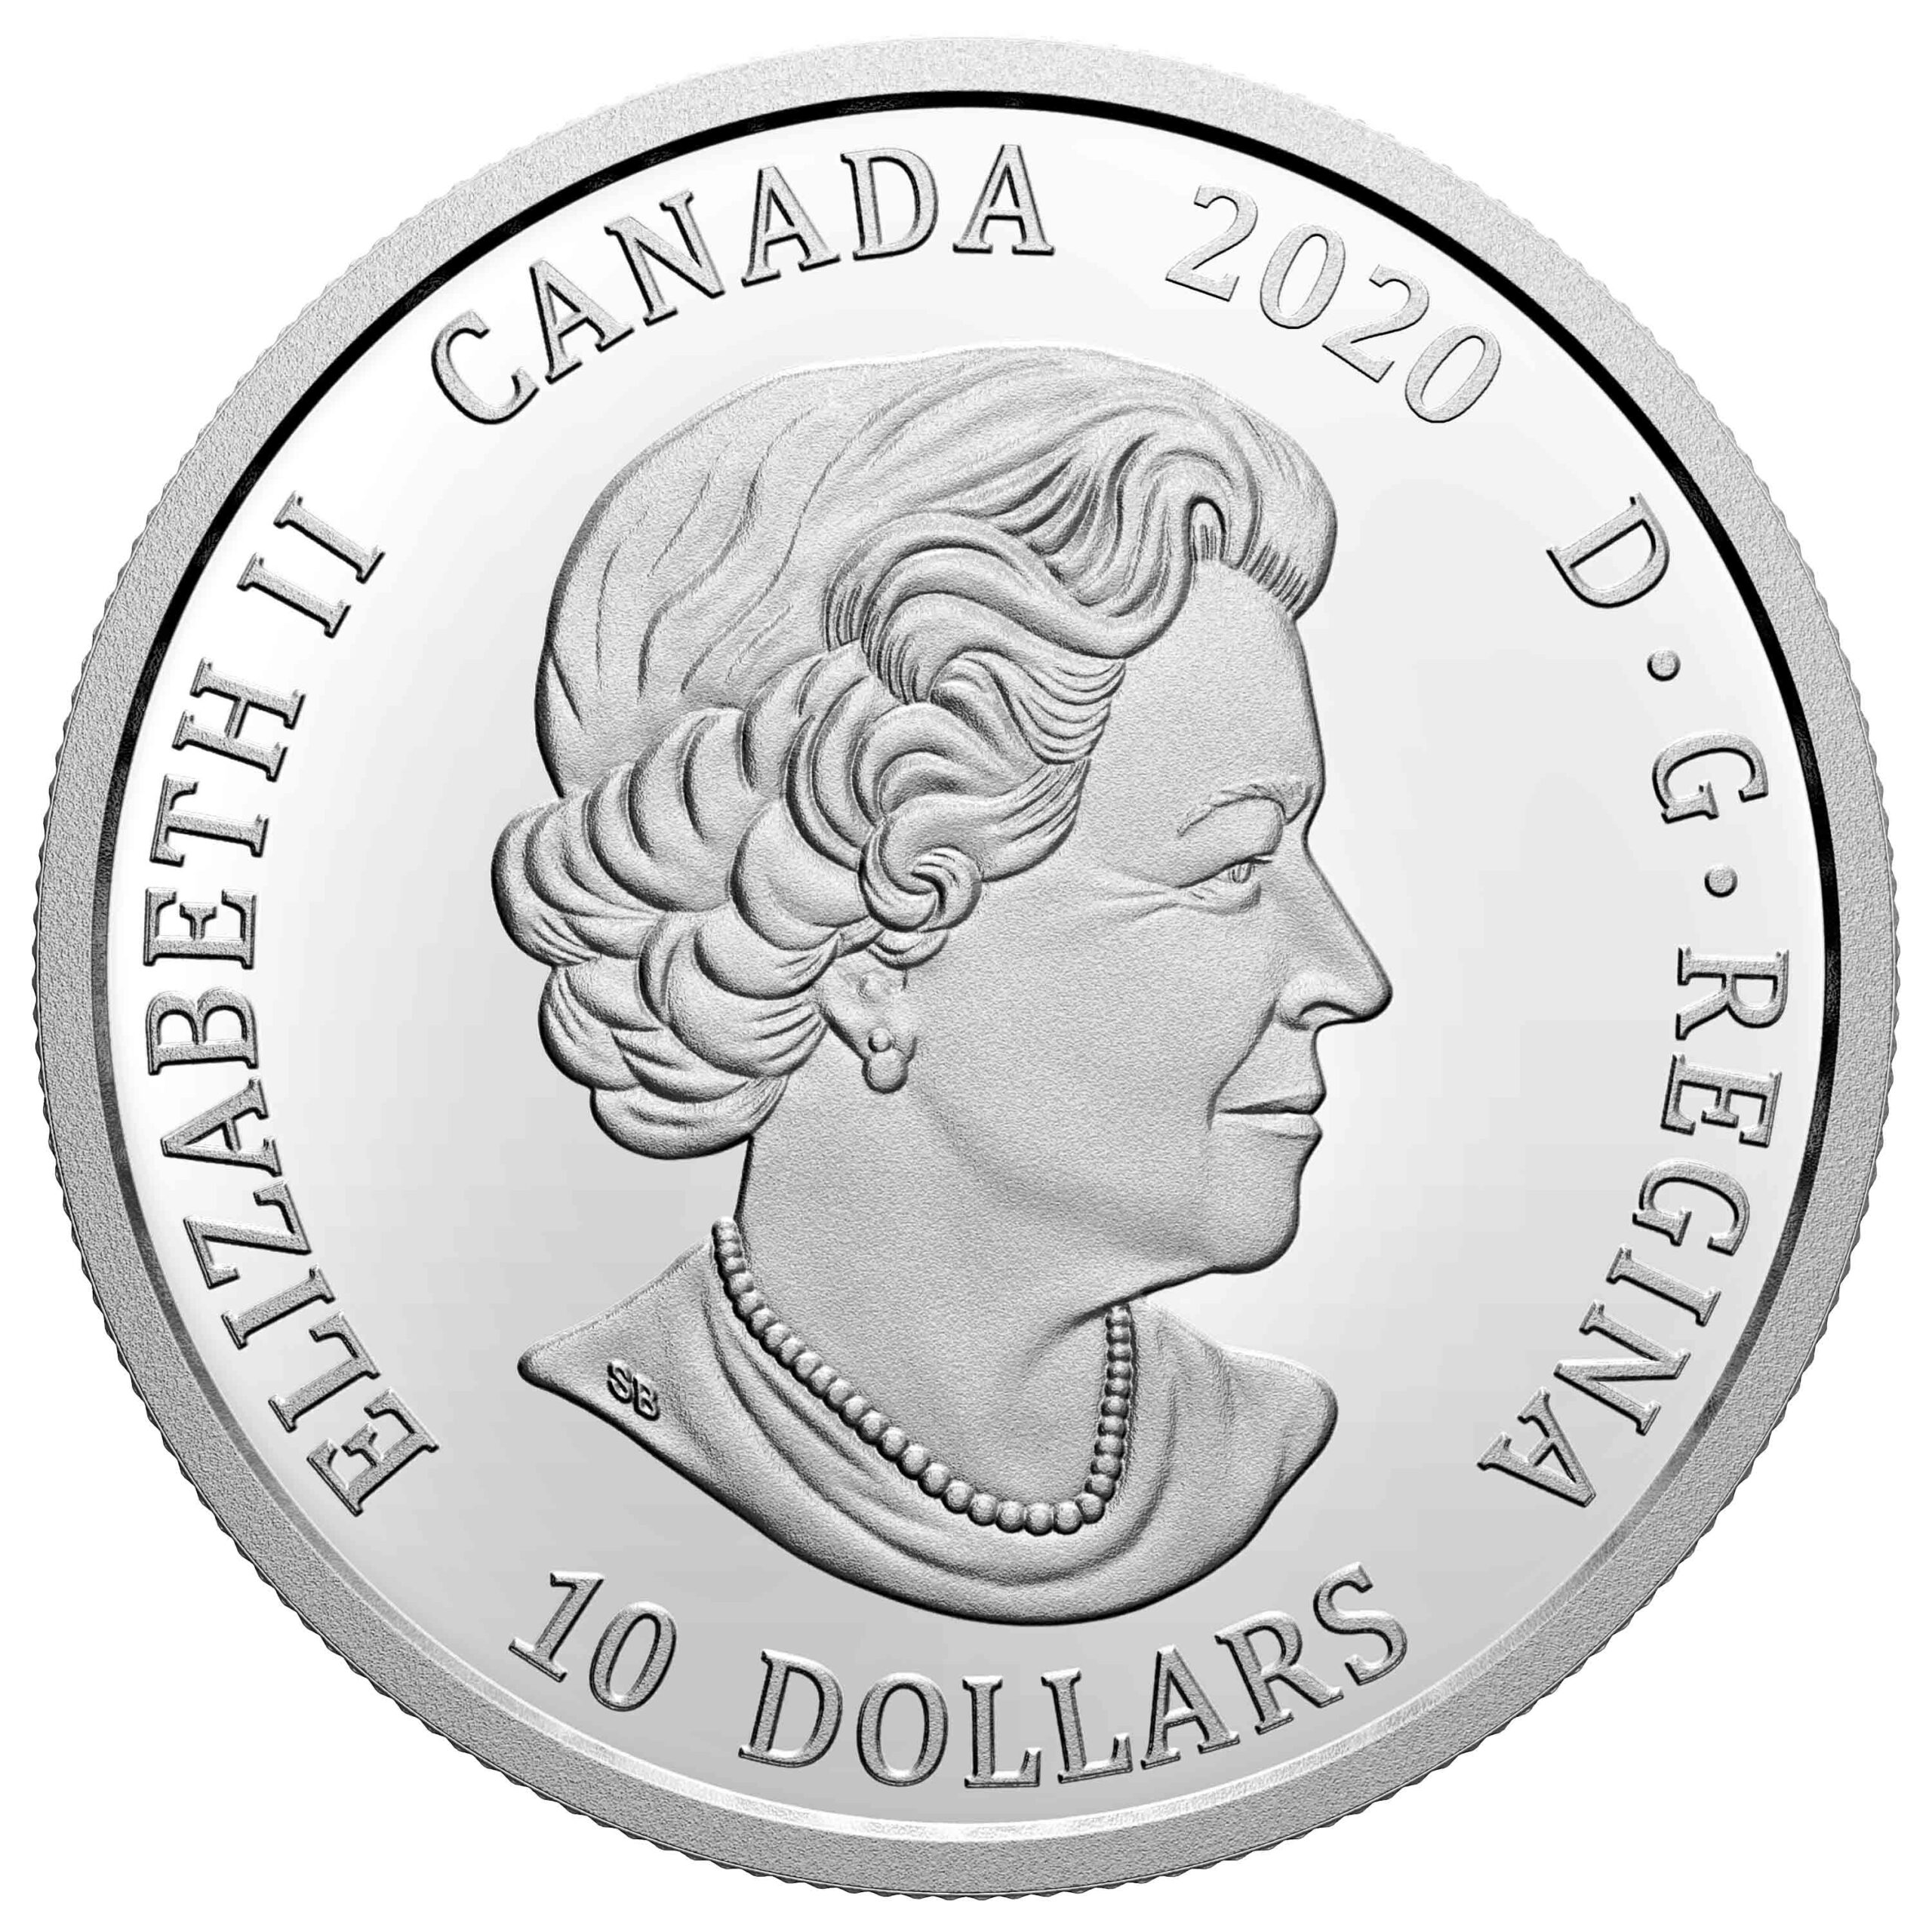 CA 10 Dollars 2020